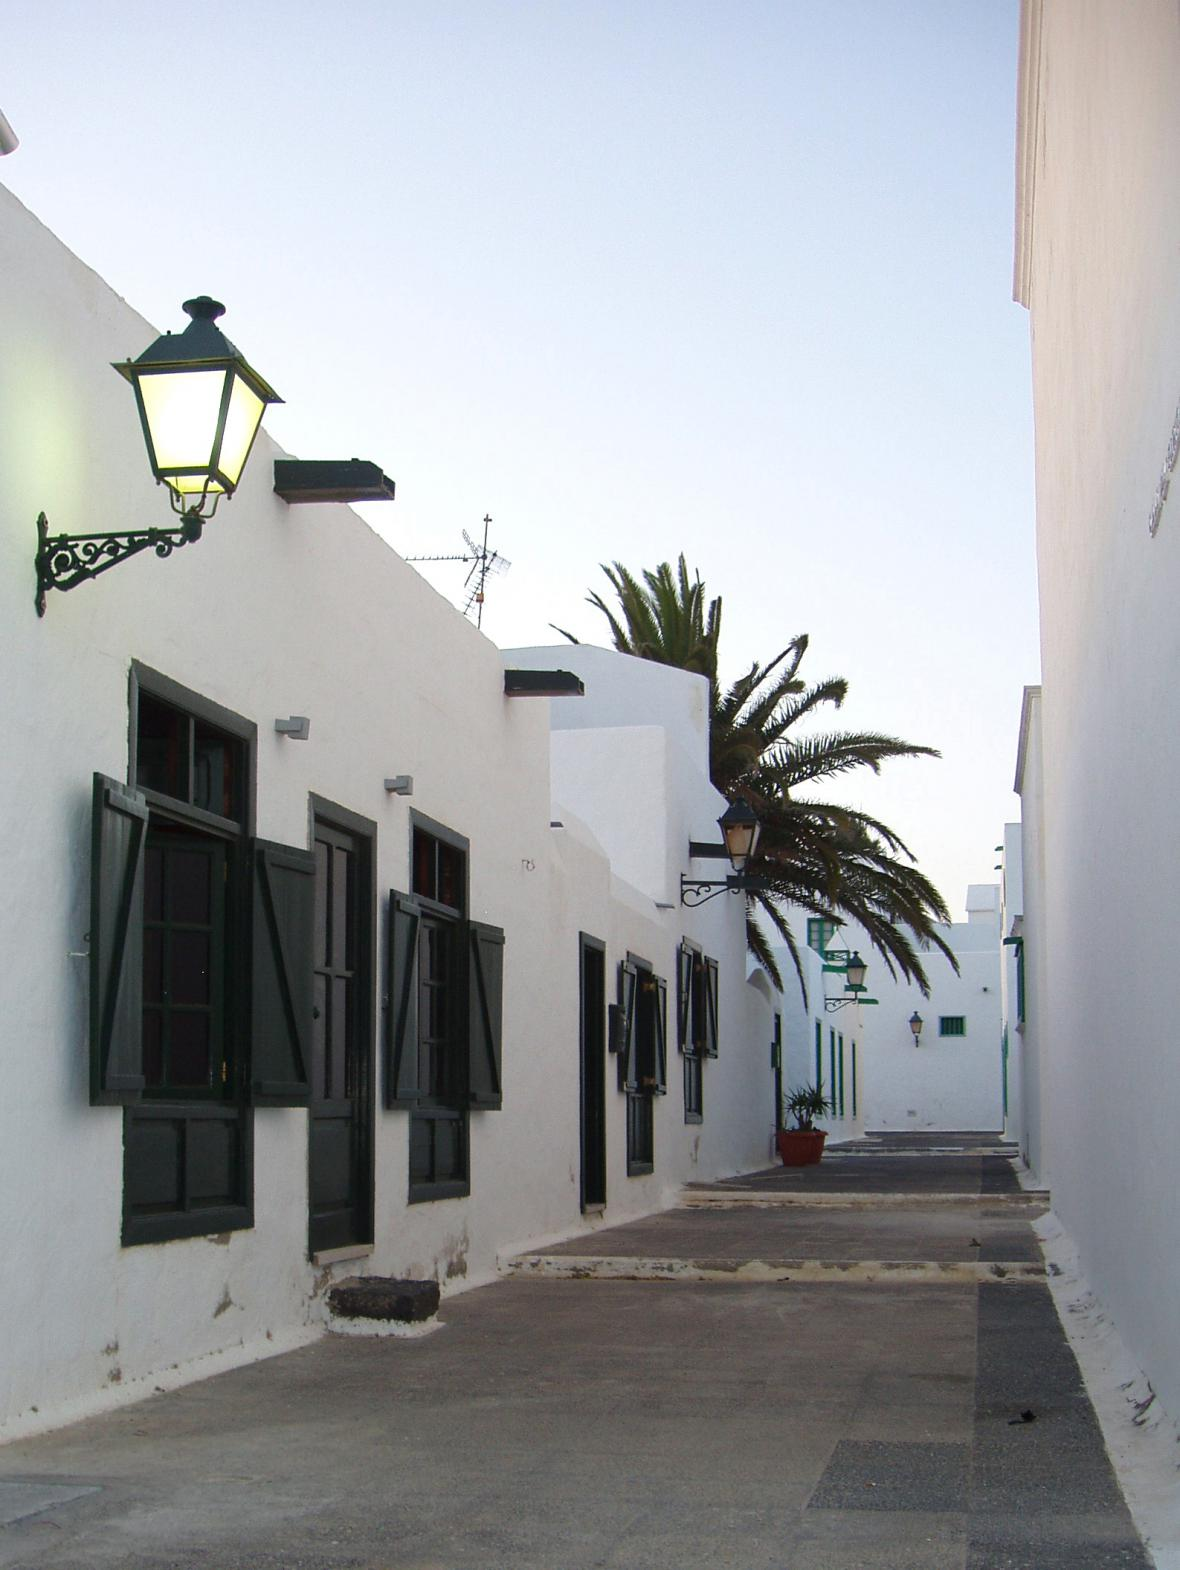 Ulička na Lanzarote